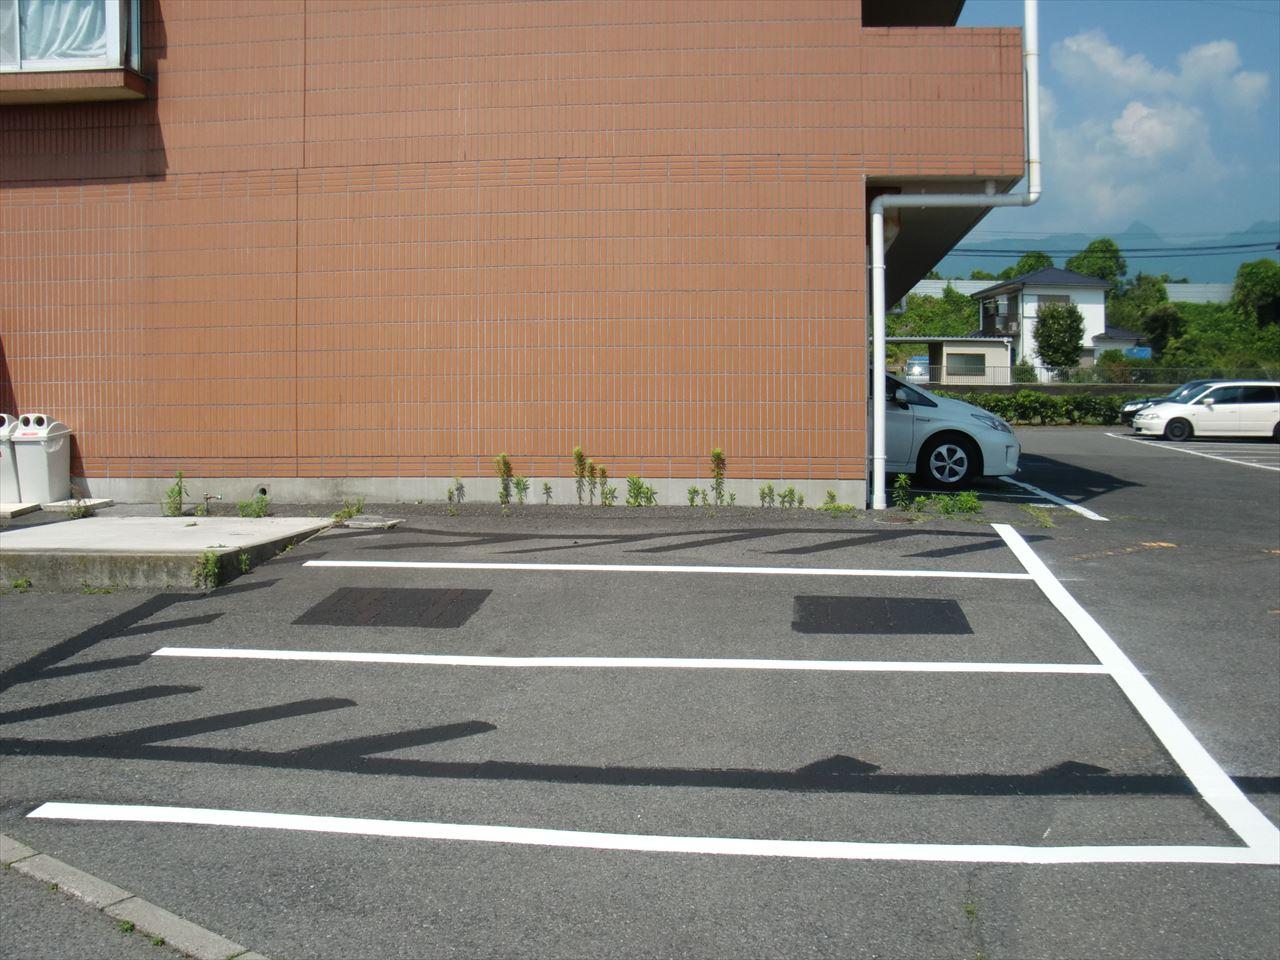 渋川市 株式会社ソアード様 区画線設置工事 施工後